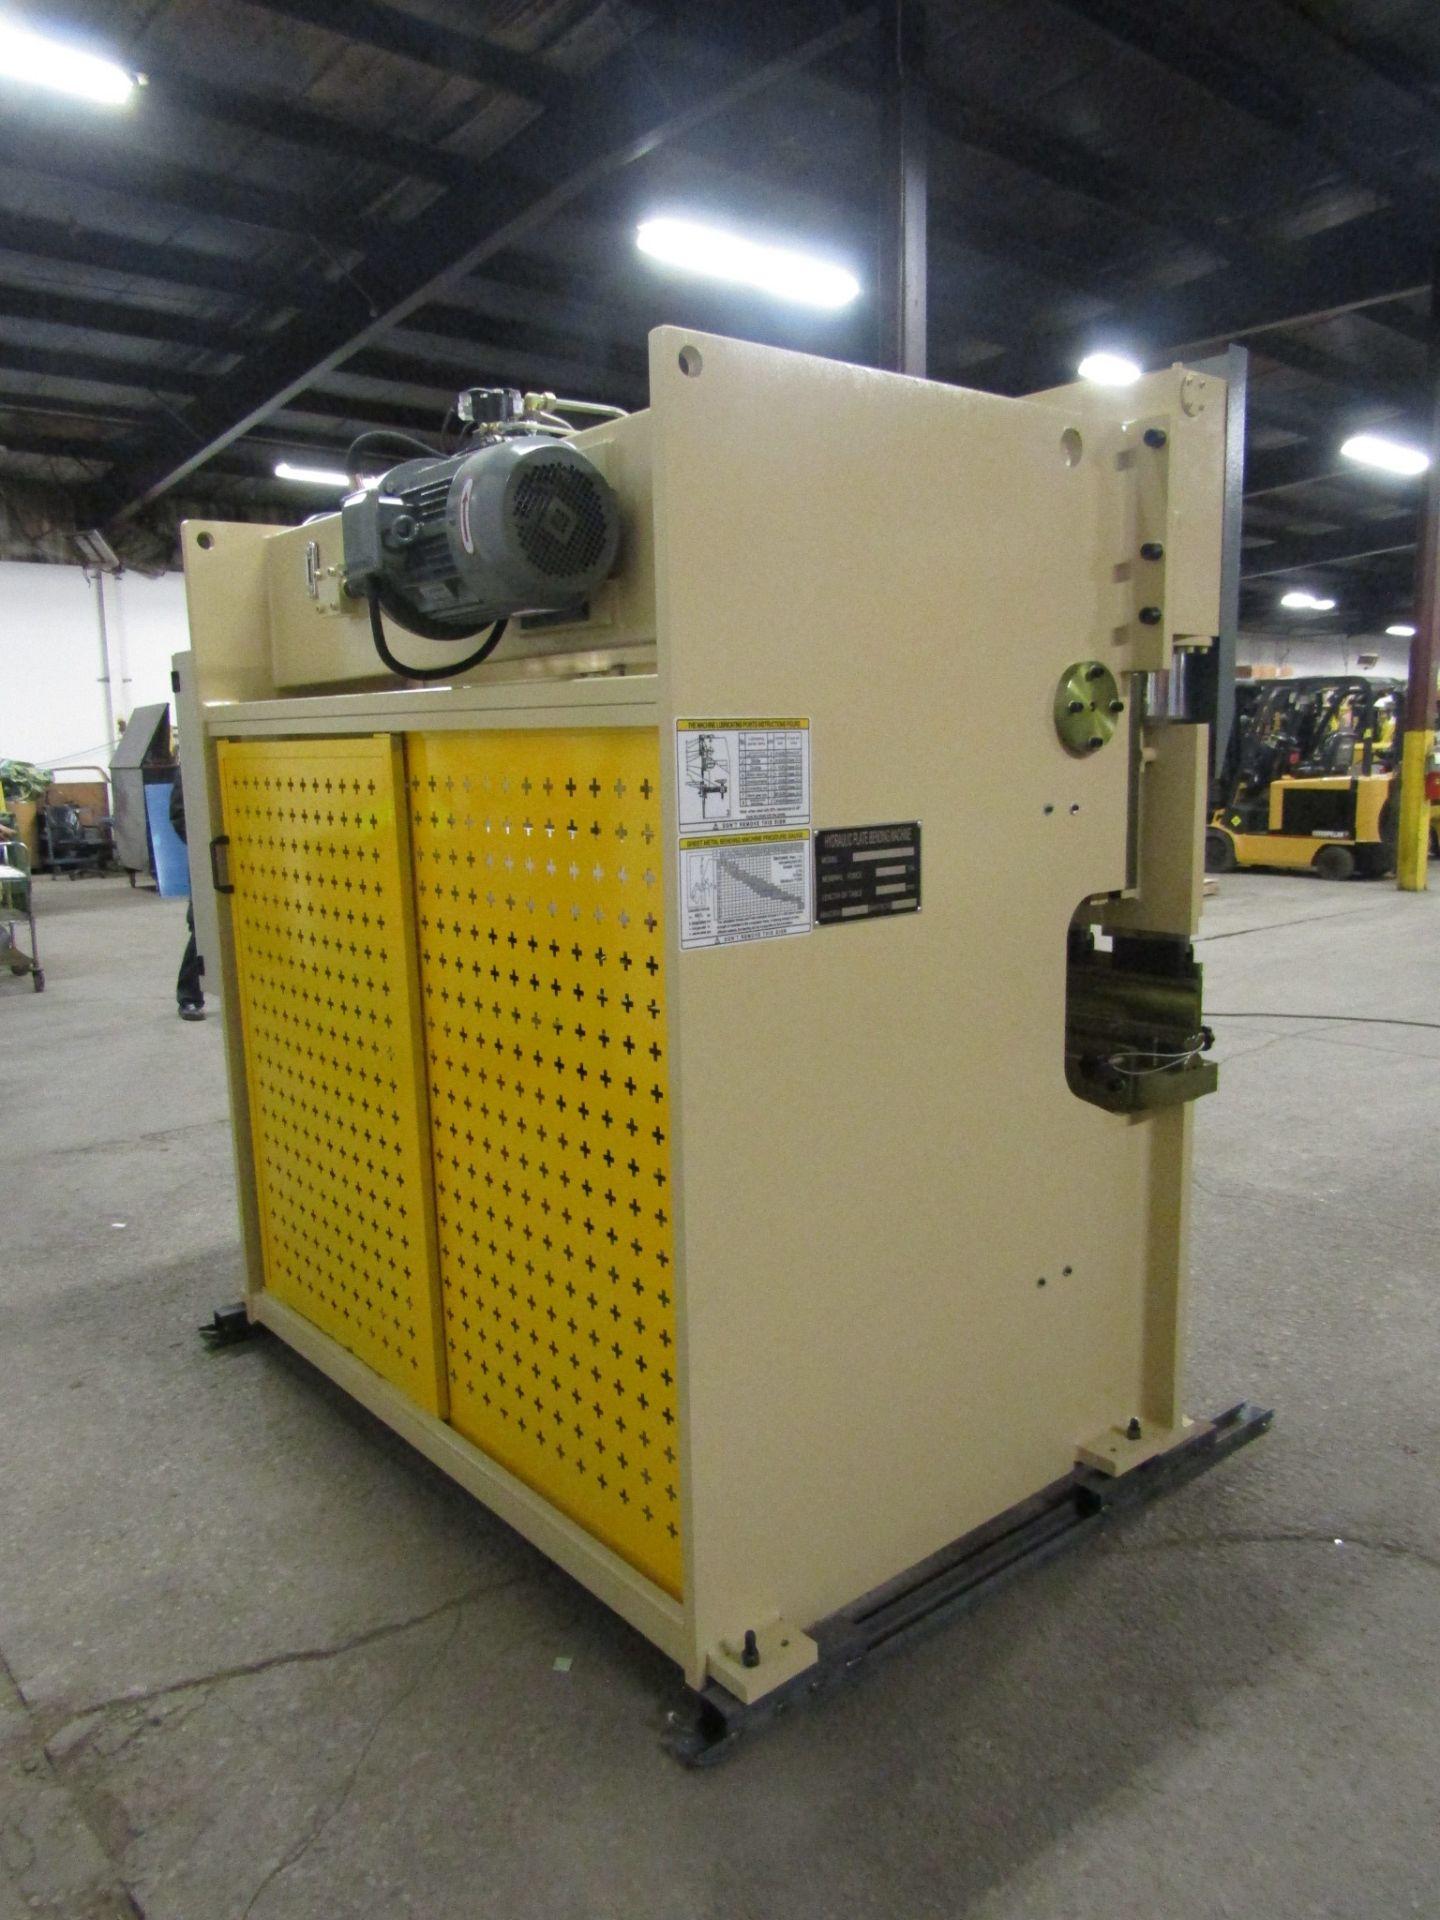 "Bernardo Hydraulic Press Brake 63 ton capacity 80"" bed - 480/575V 3 phase with CNC back gauge and - Image 3 of 3"